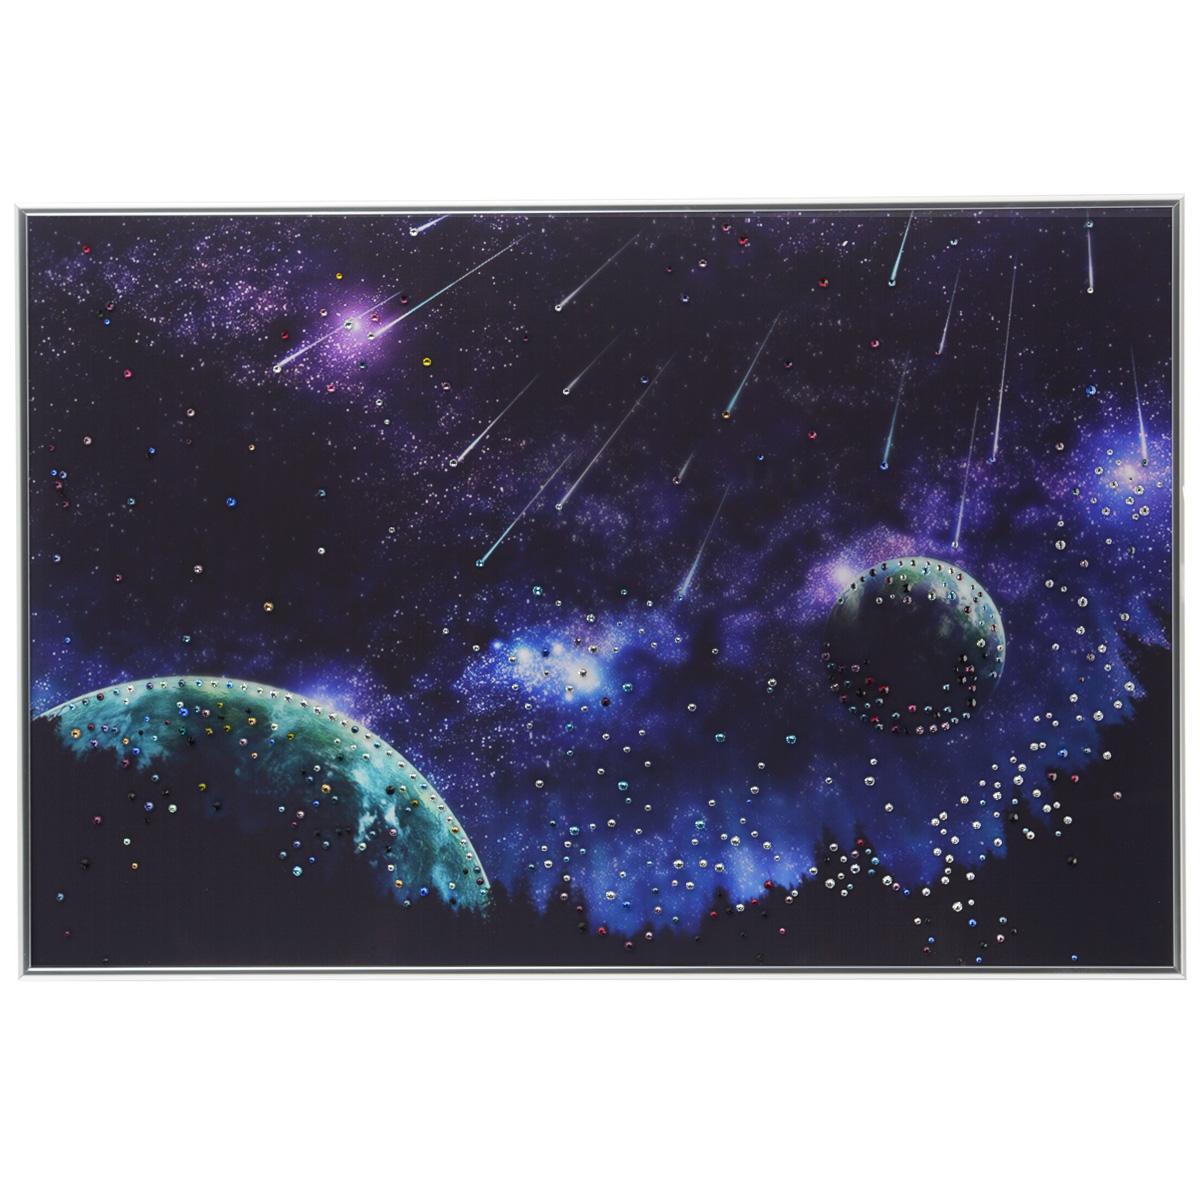 Картина с кристаллами Swarovski Звездопад, 60 см х 40 см картины в квартиру картина etude 2 102х130 см